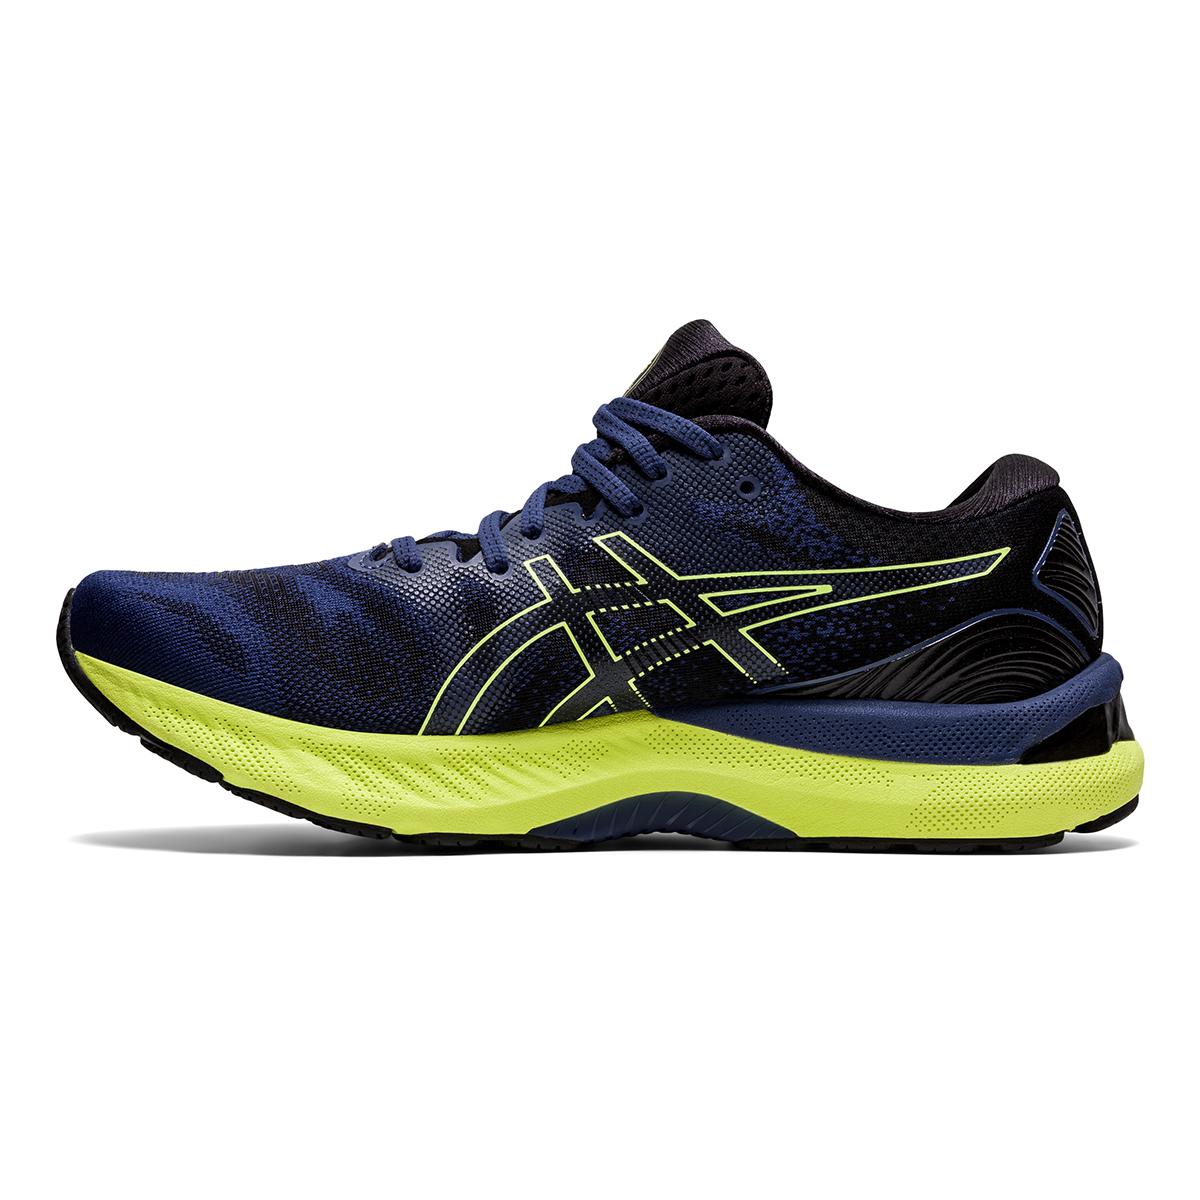 Men's Asics Gel-Nimbus 23 Running Shoe - Color: Thunder Blue - Size: 7 - Width: Regular, Thunder Blue, large, image 2